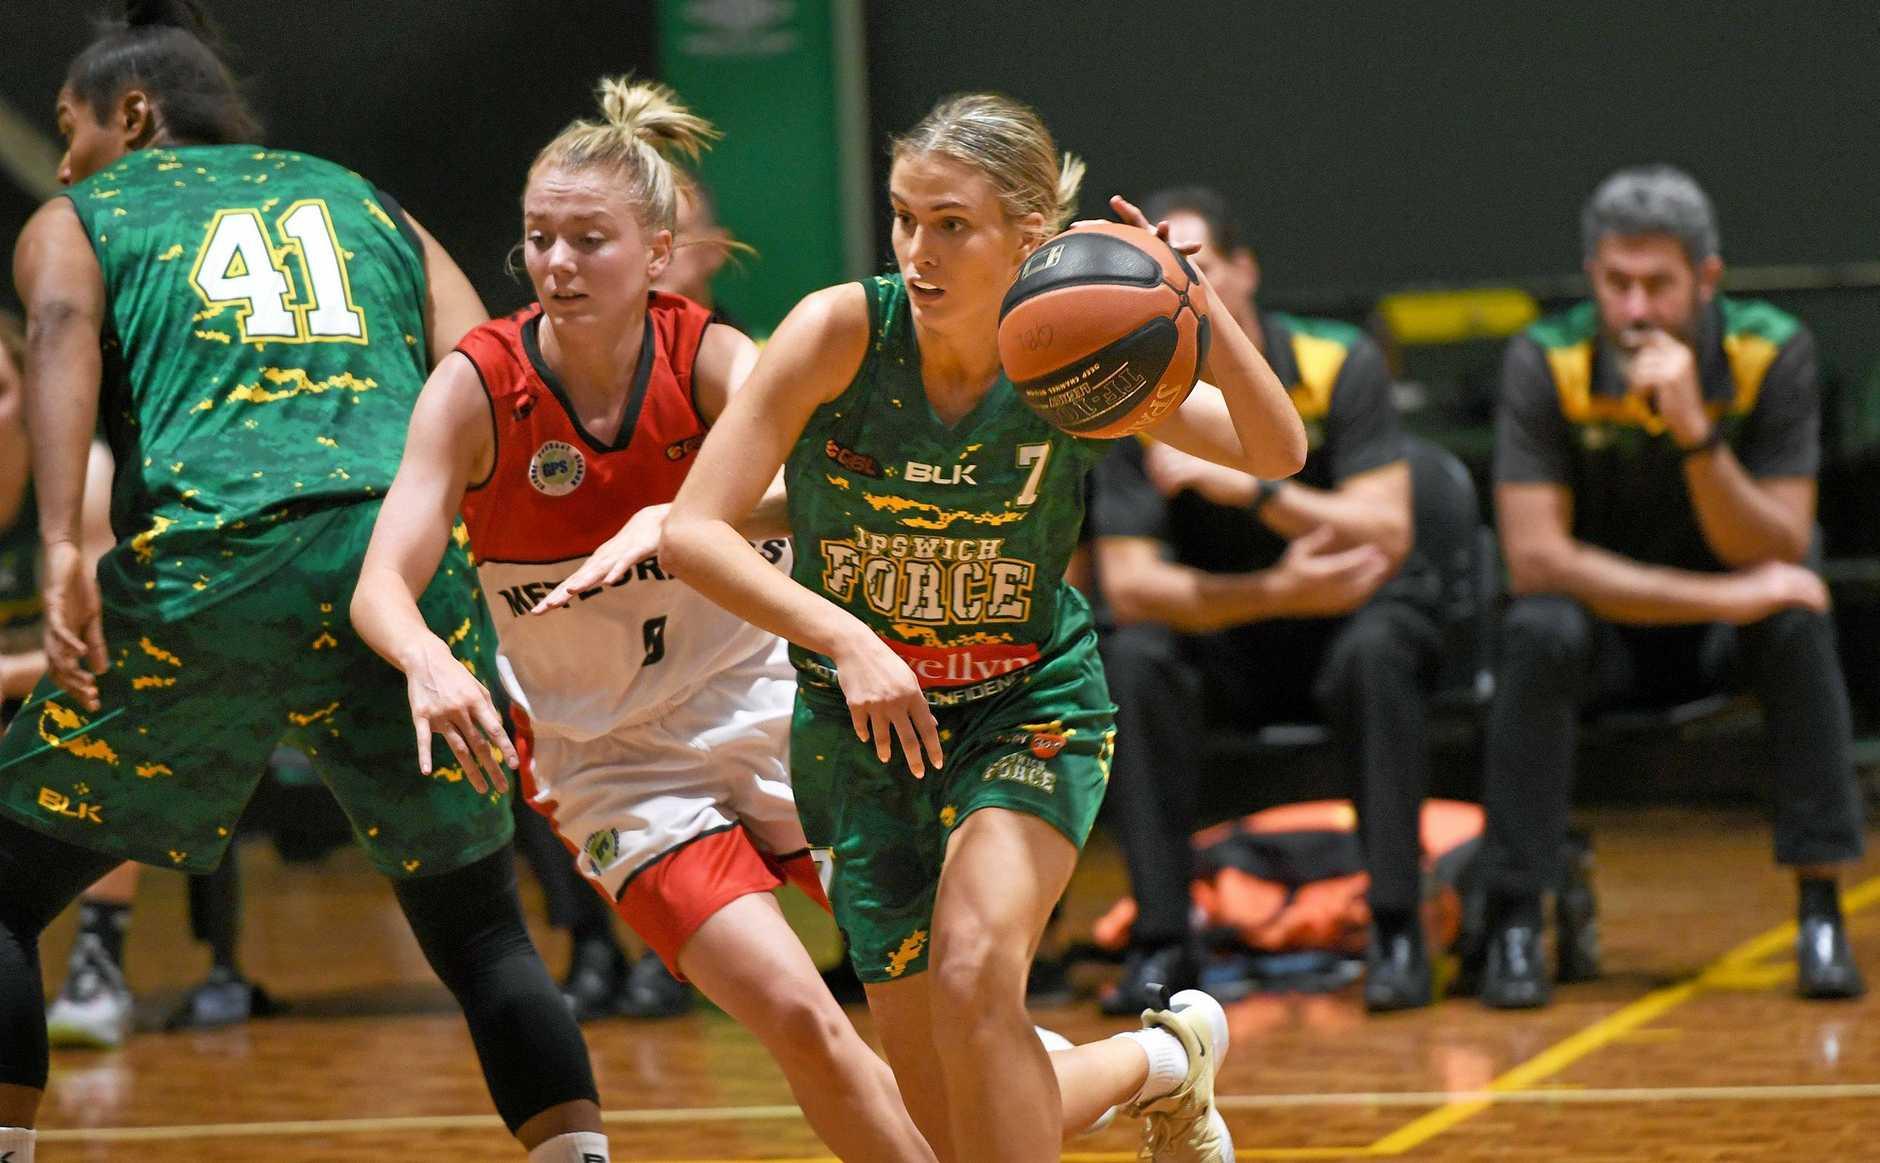 Ipswich Force V Mackay women played at Ipswich Basketball Stadium on Sunday. Georgia Williams